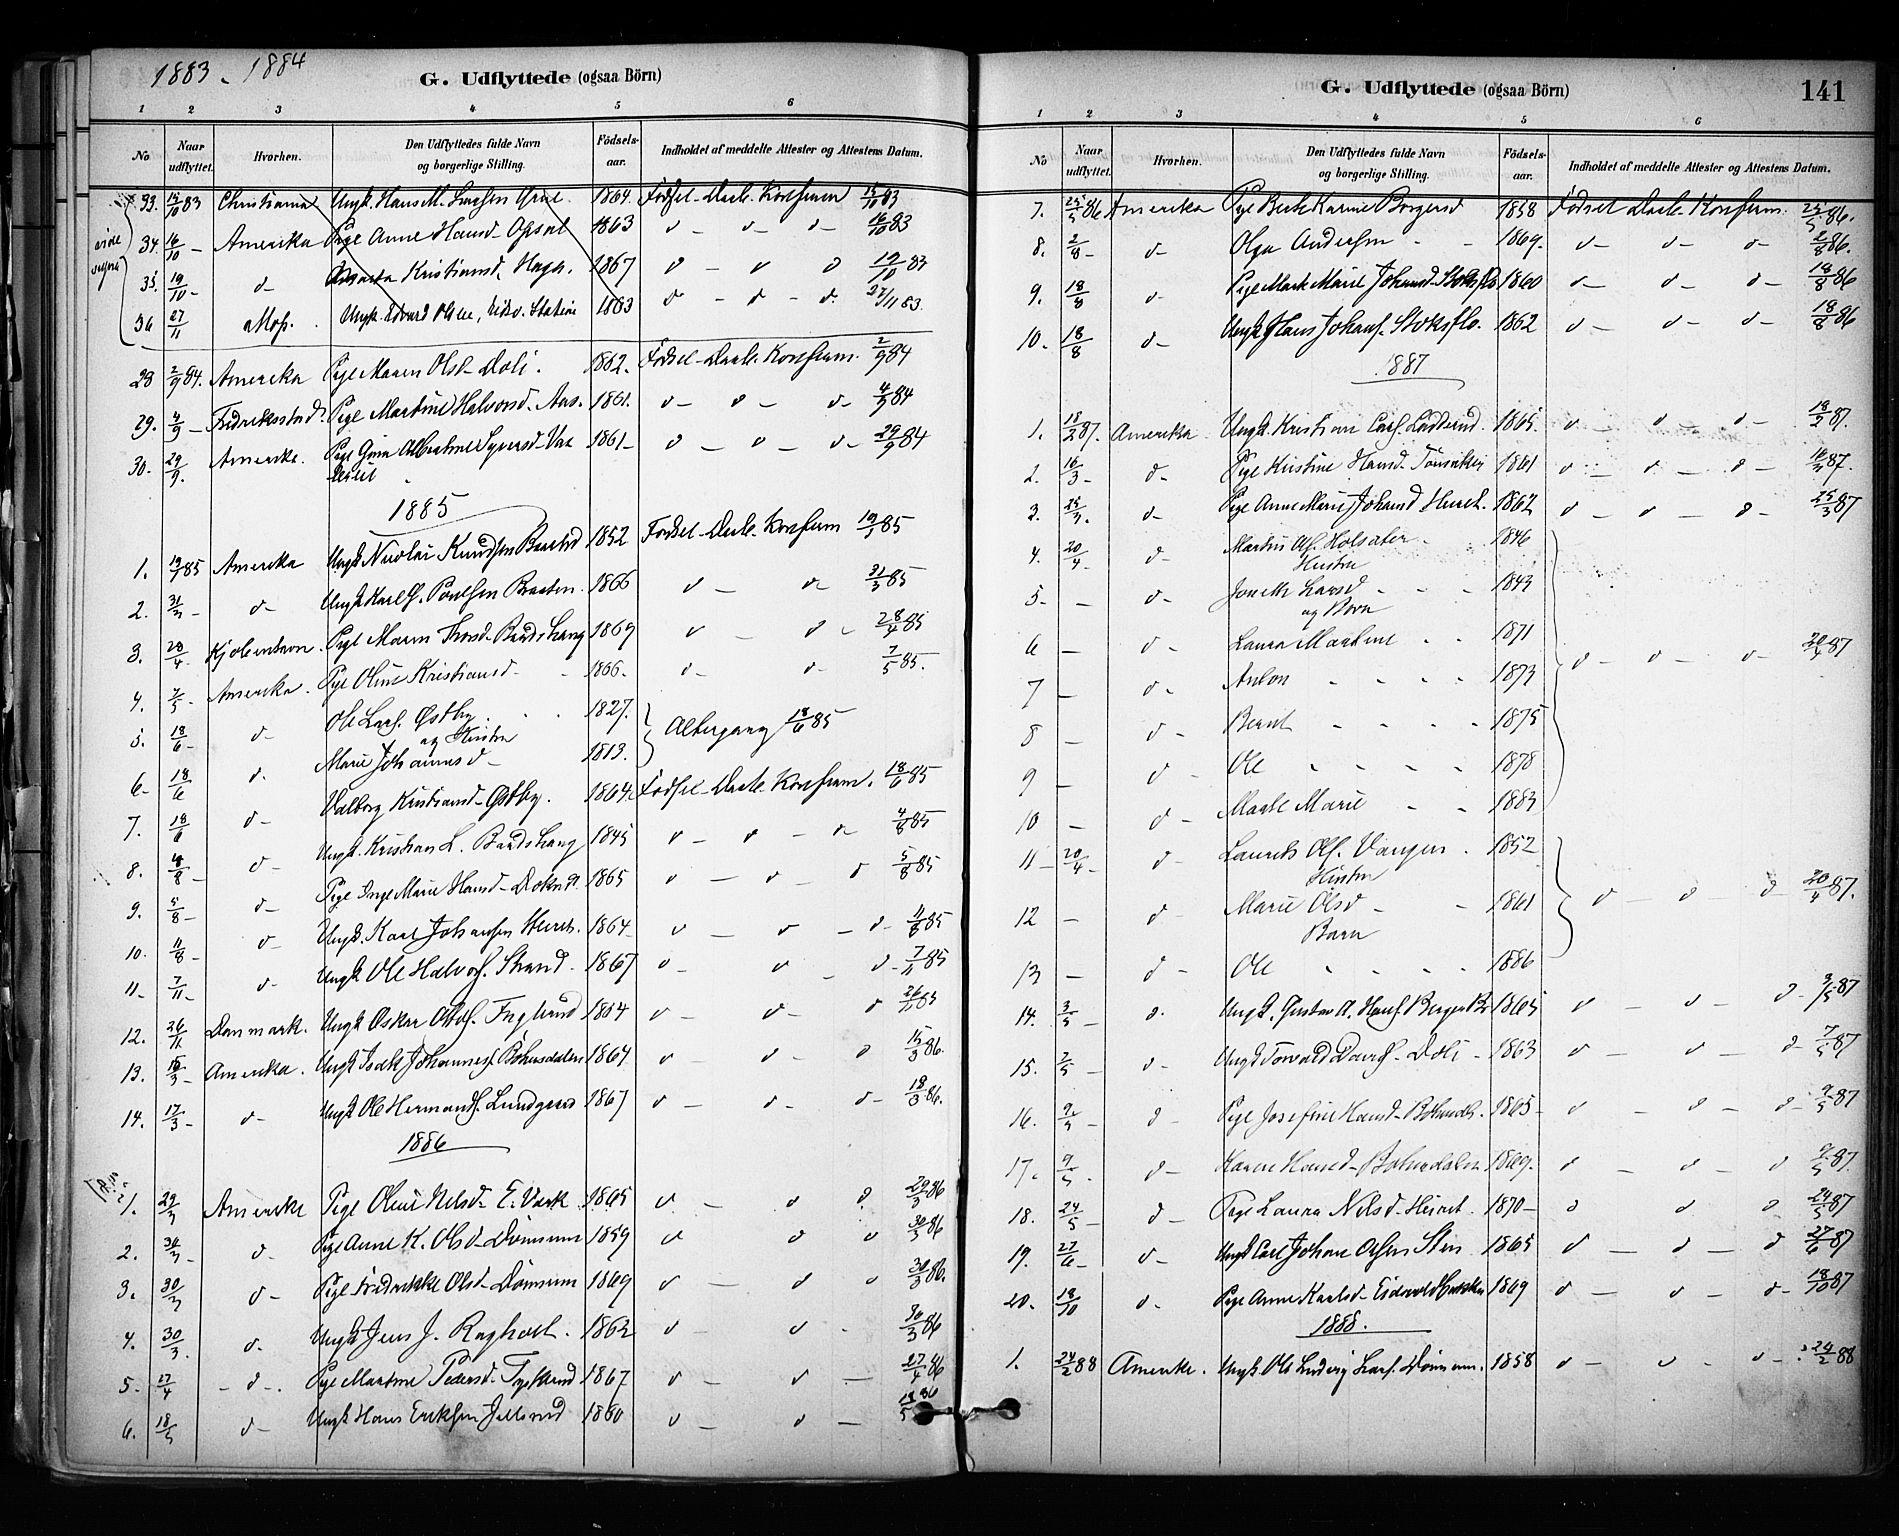 SAO, Eidsvoll prestekontor Kirkebøker, F/Fa/L0003: Parish register (official) no. I 3, 1882-1895, p. 141